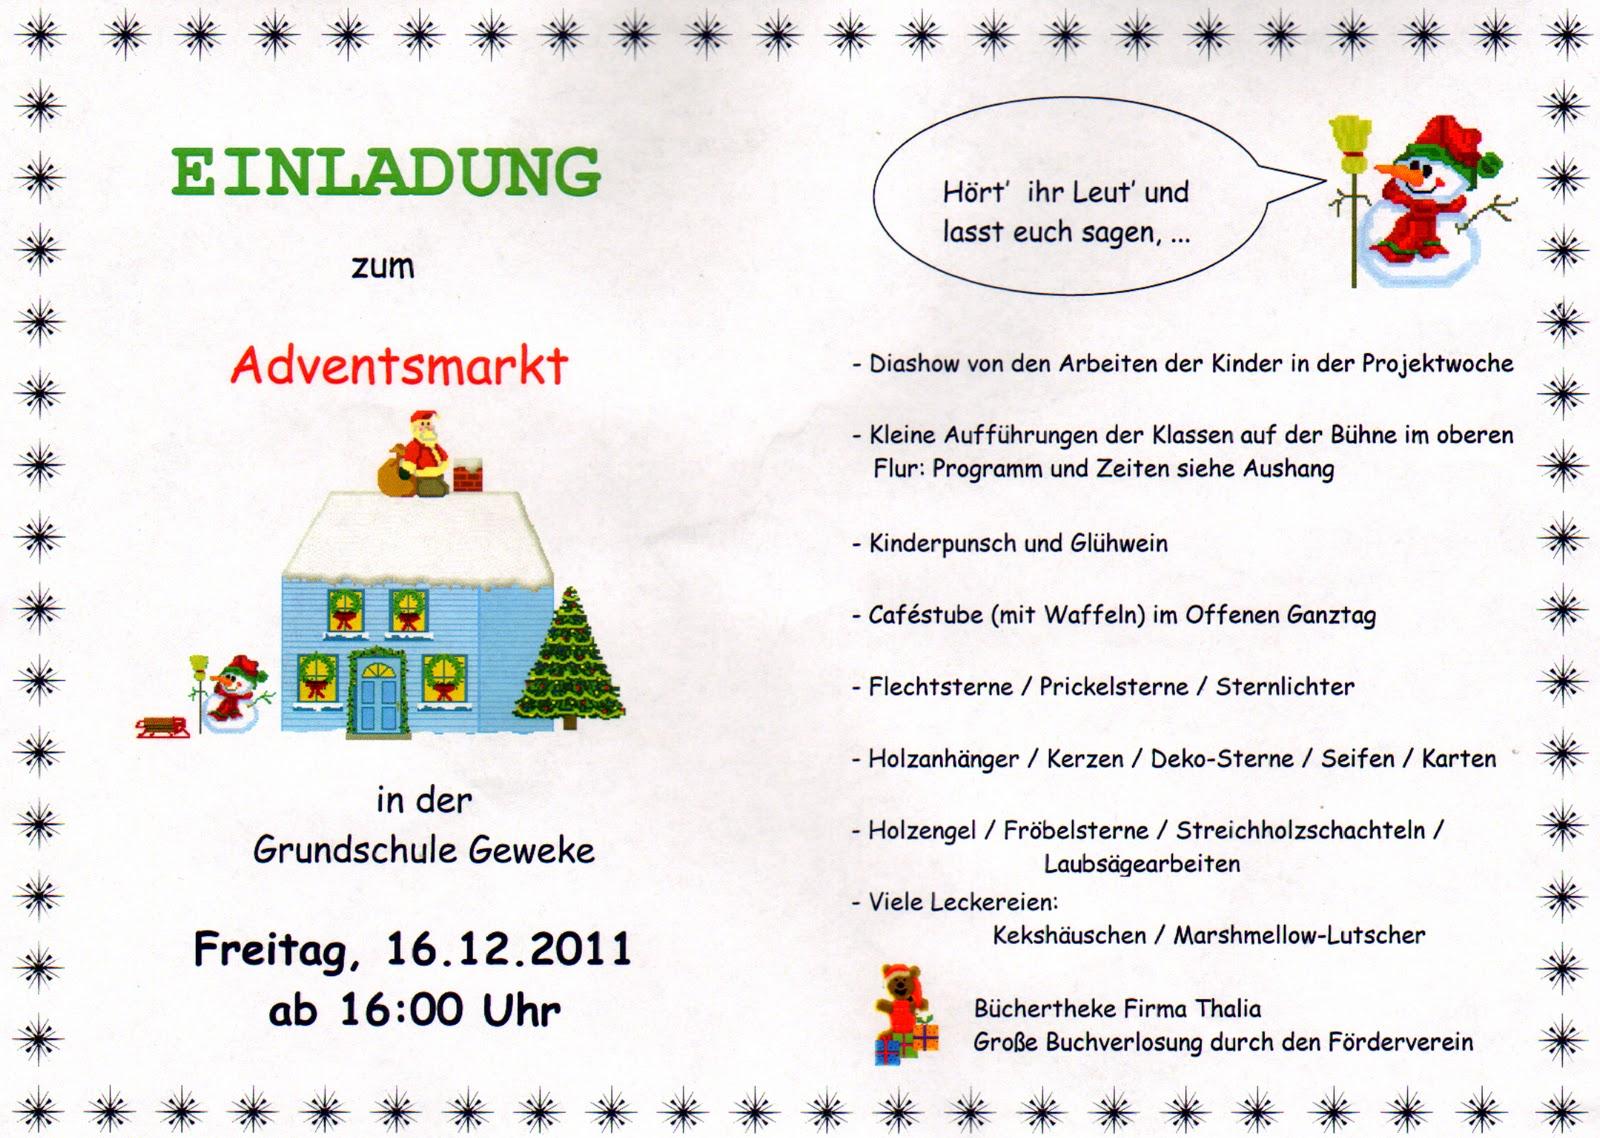 grundschule geweke: 04.12.11 - 11.12.11, Einladung